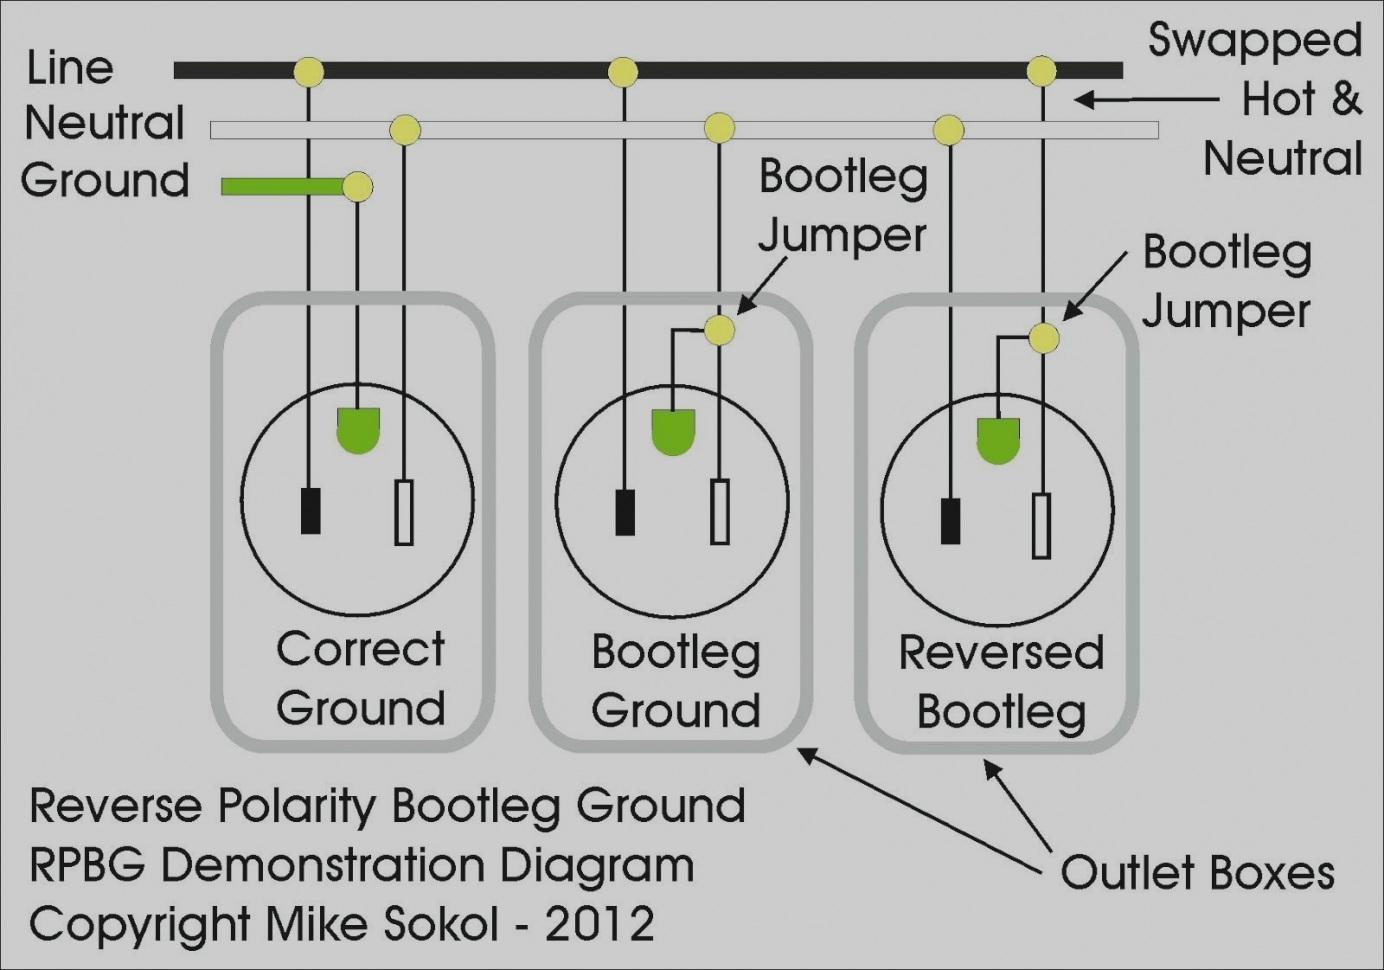 Outlets Wiring Harness Wiring Diagram Wiring Schematics Free